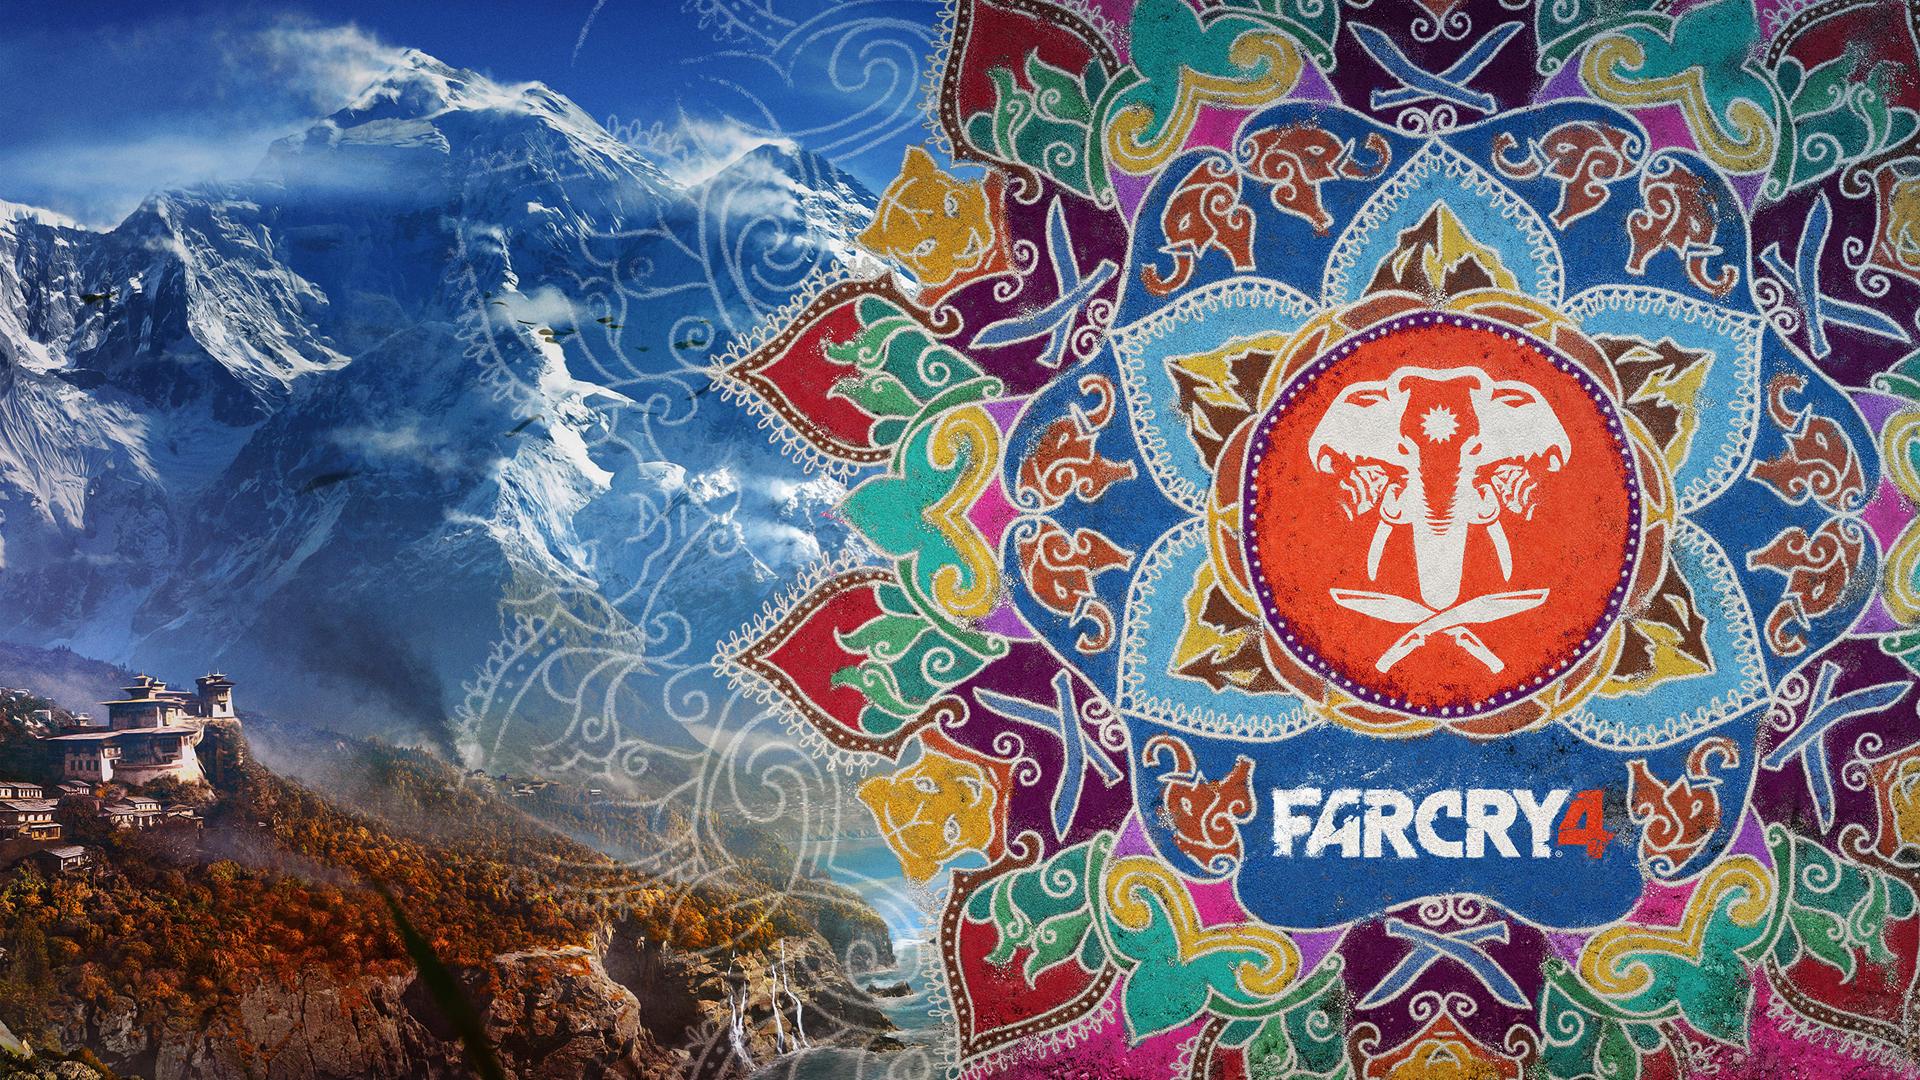 Far Cry 4 Wallpaper Elephant: Far Cry 4 Wallpaper 1920x1080